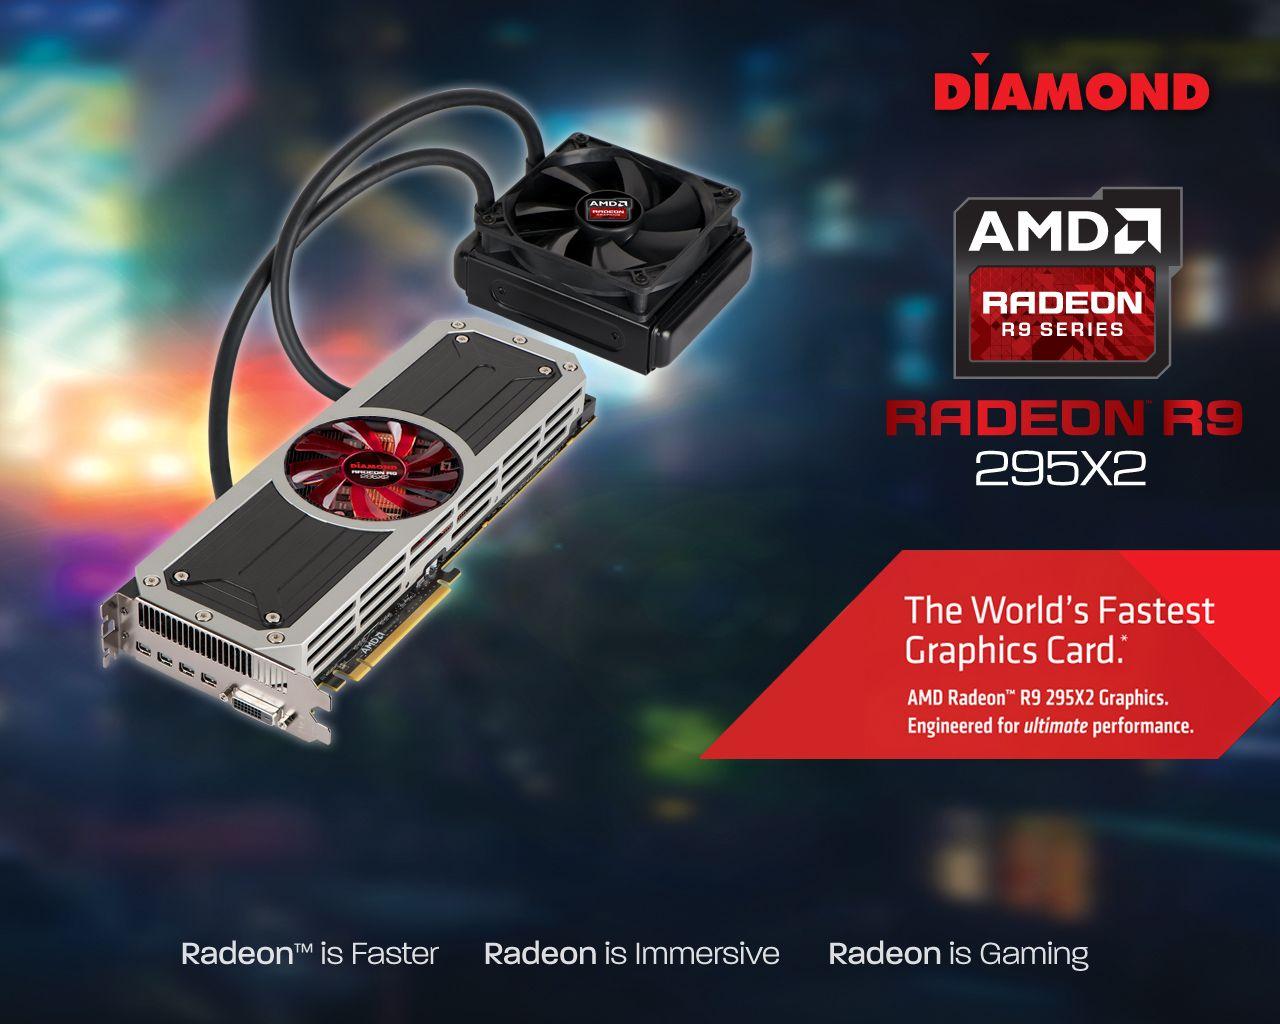 Diamond Amd R9 295x2 Pcie Gddr5 8gb Memory Dual Gpu Dual Water Block Cooler Video Card Graphic Card Video Card Amd